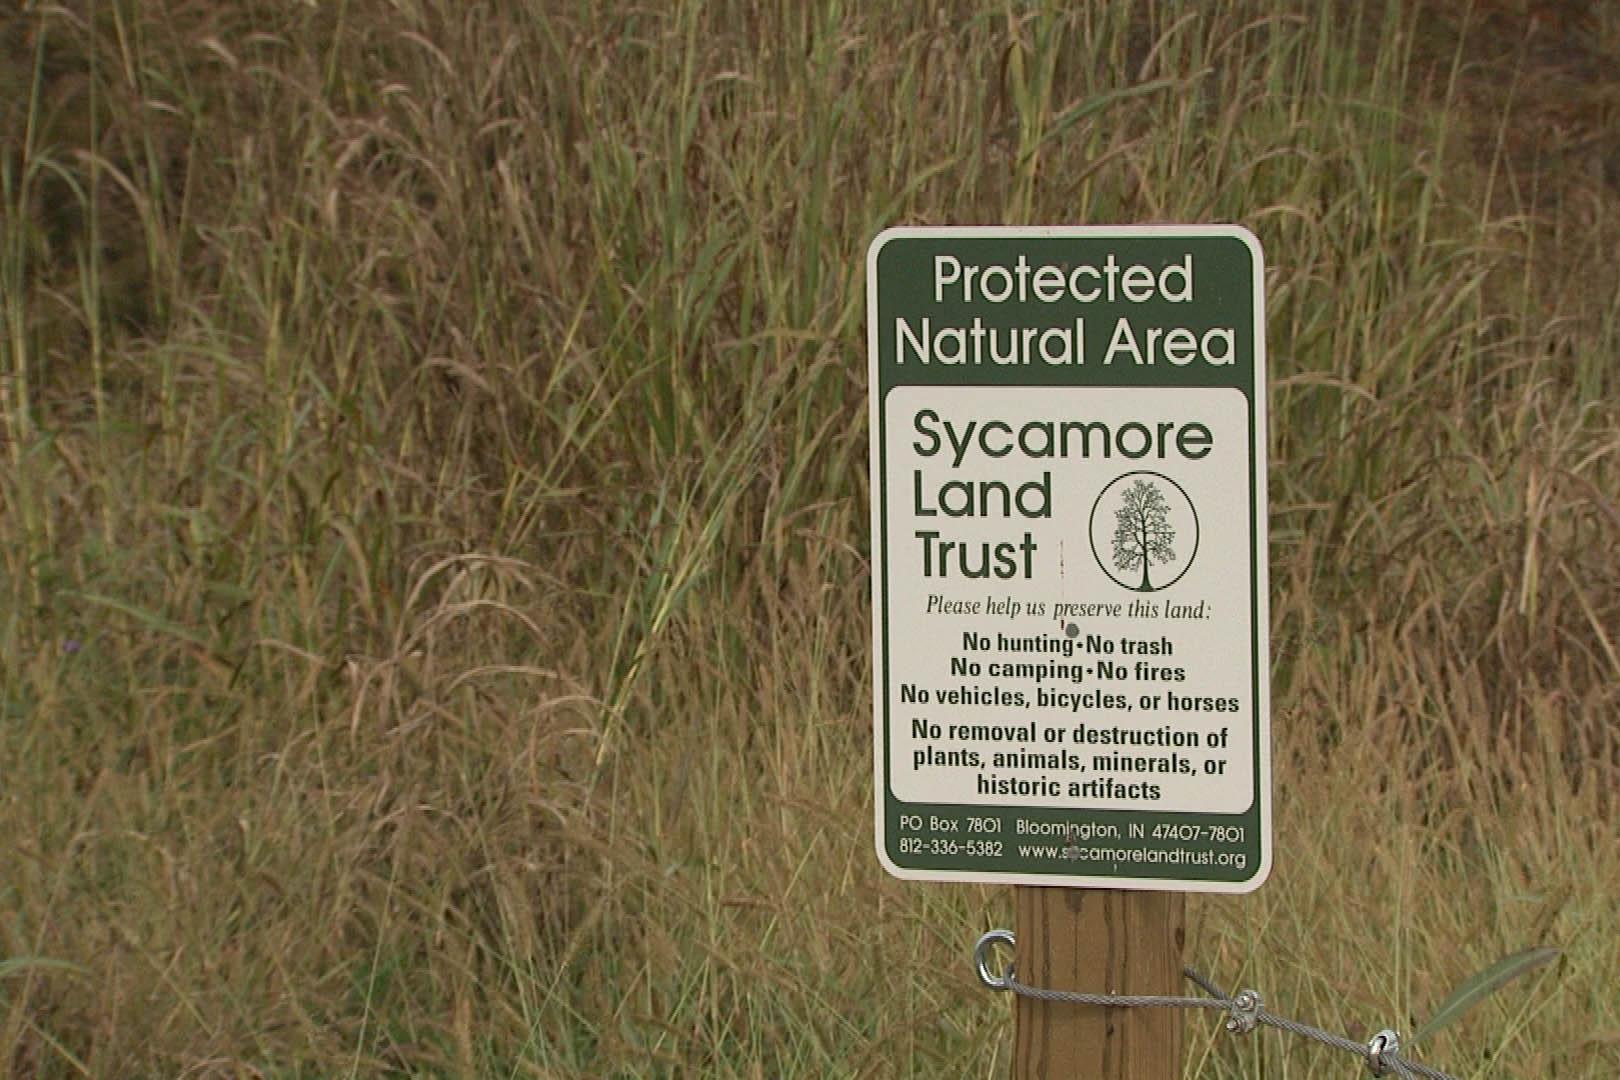 Sycamore Land Trust